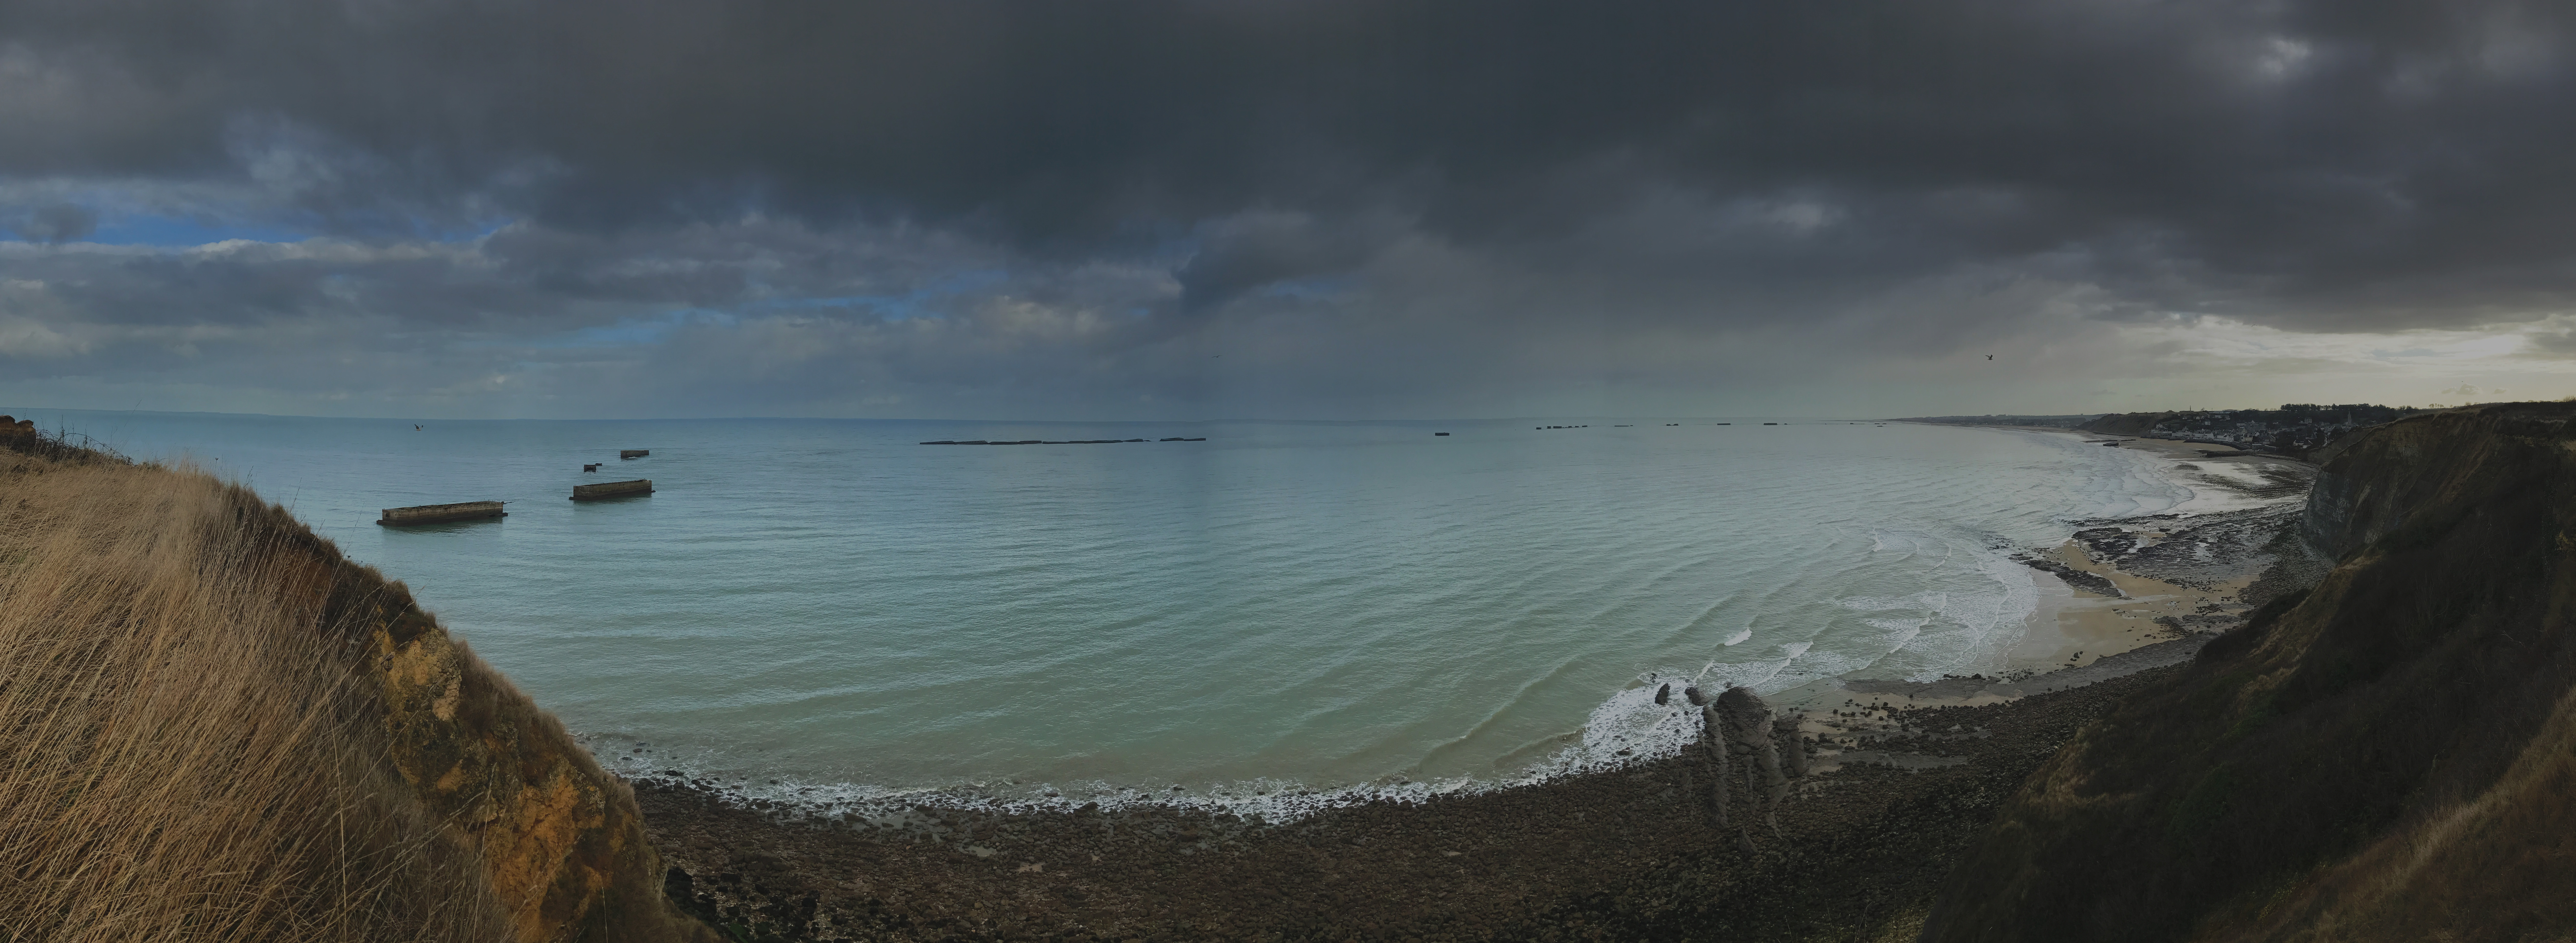 Mulberry Harbor Arromanches Gold beach landscape.jpg